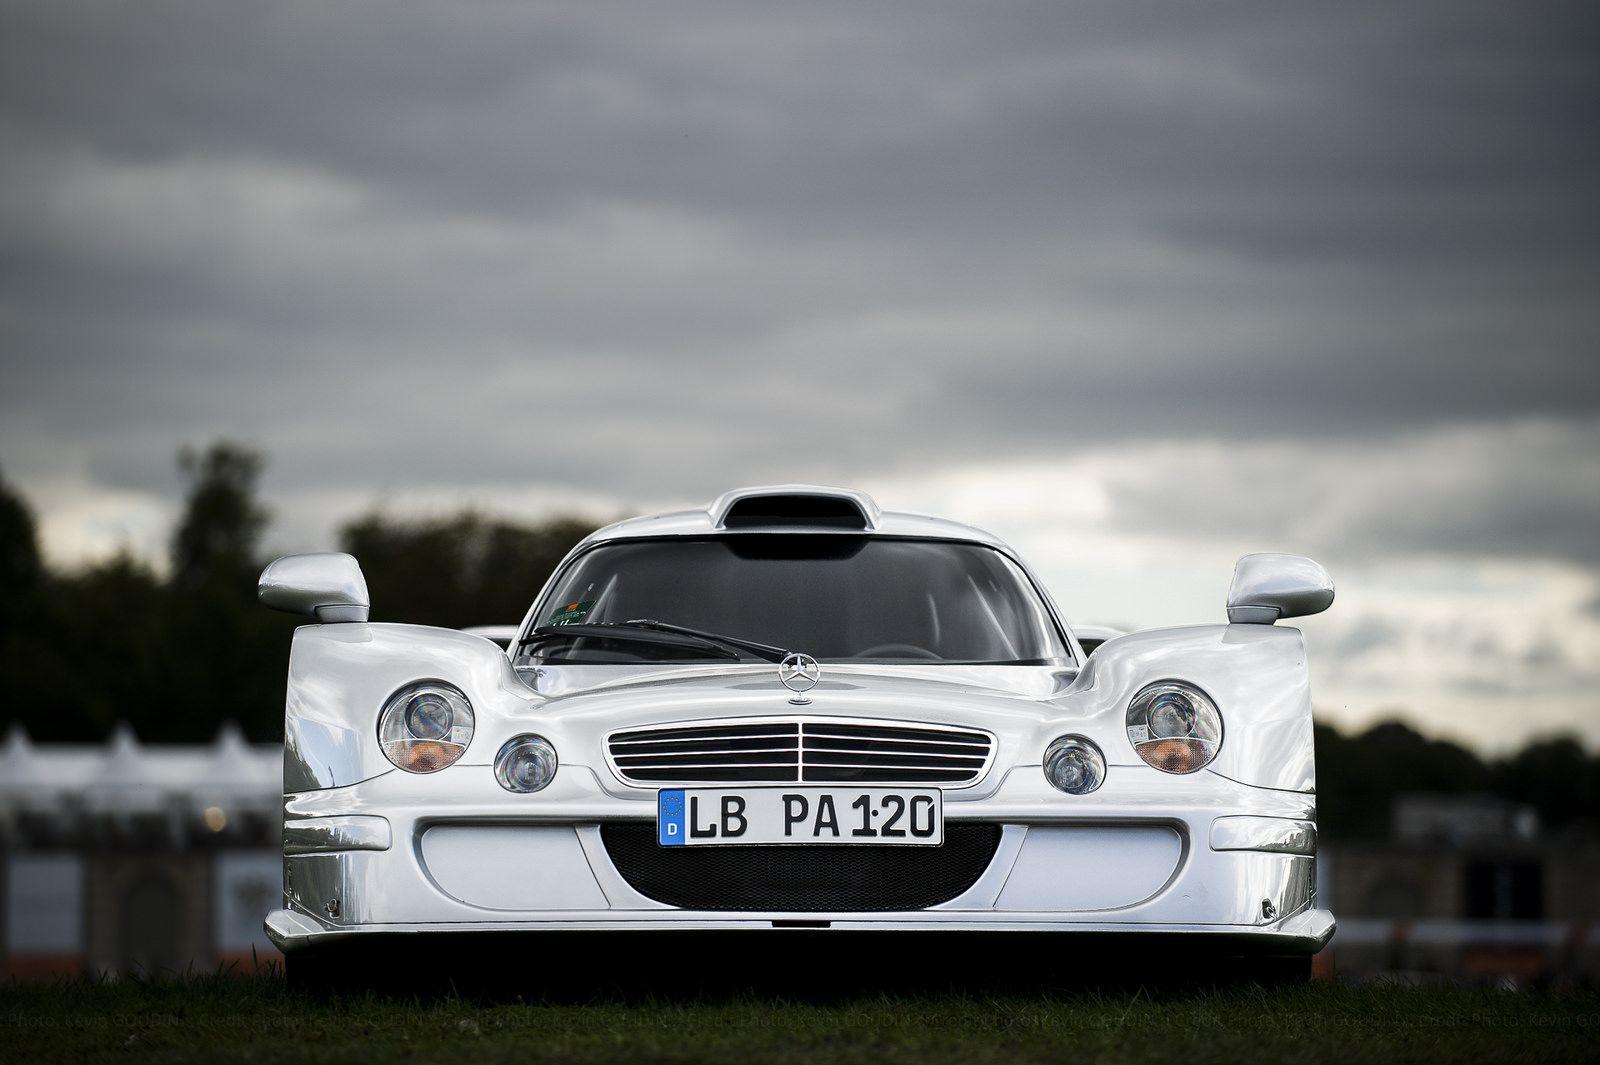 Mercedes benz clk lm stra enversion mercedes benz for Mercedes benz clk